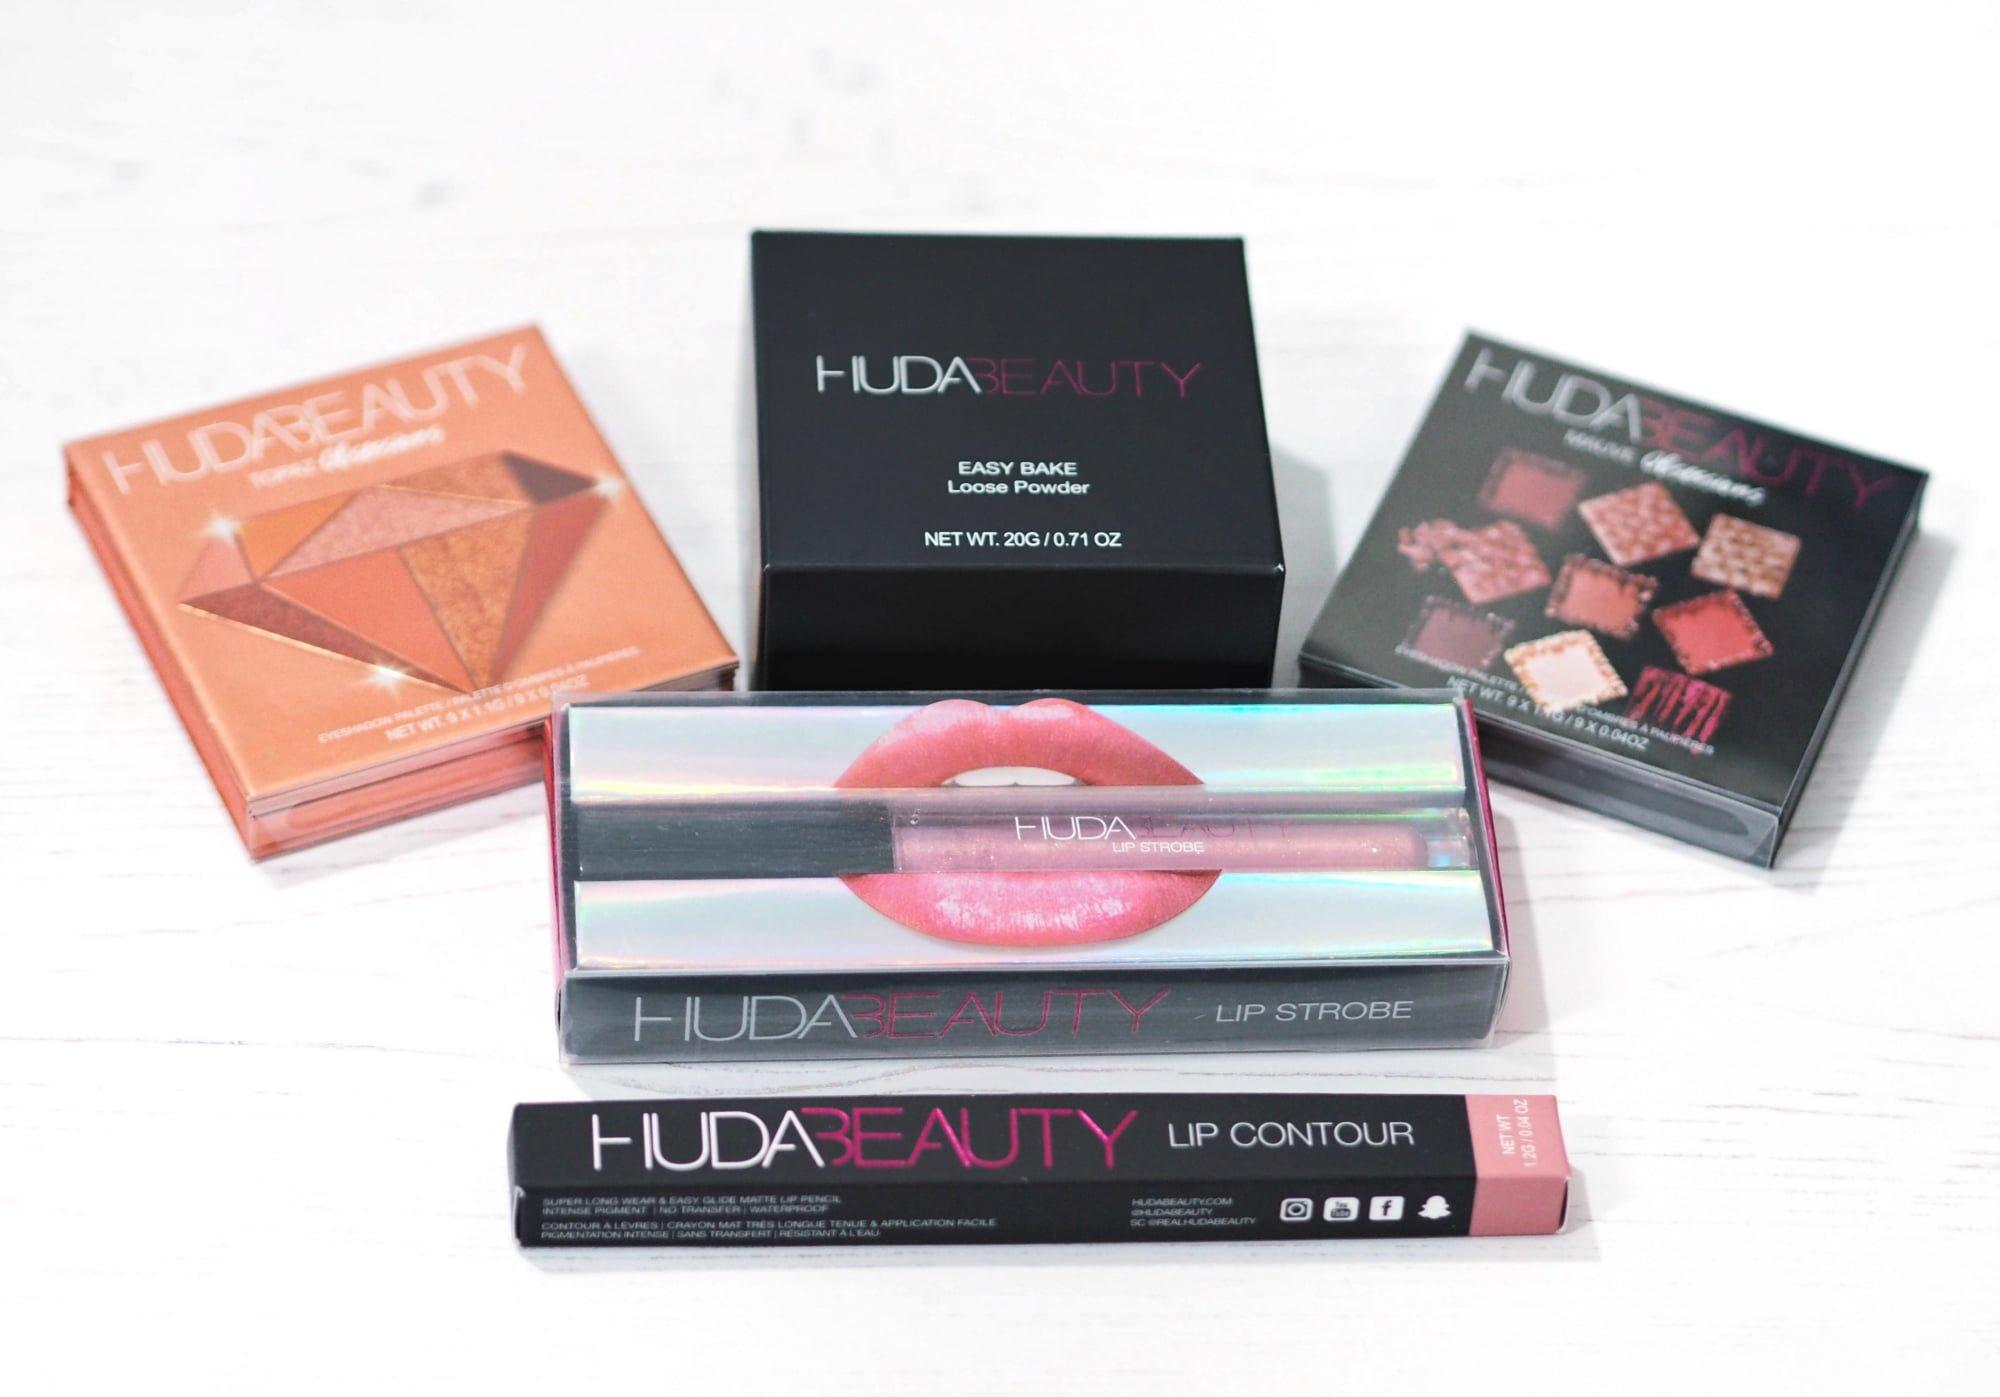 Huda Beauty | Cult Beauty Brand of the Month – November 2018